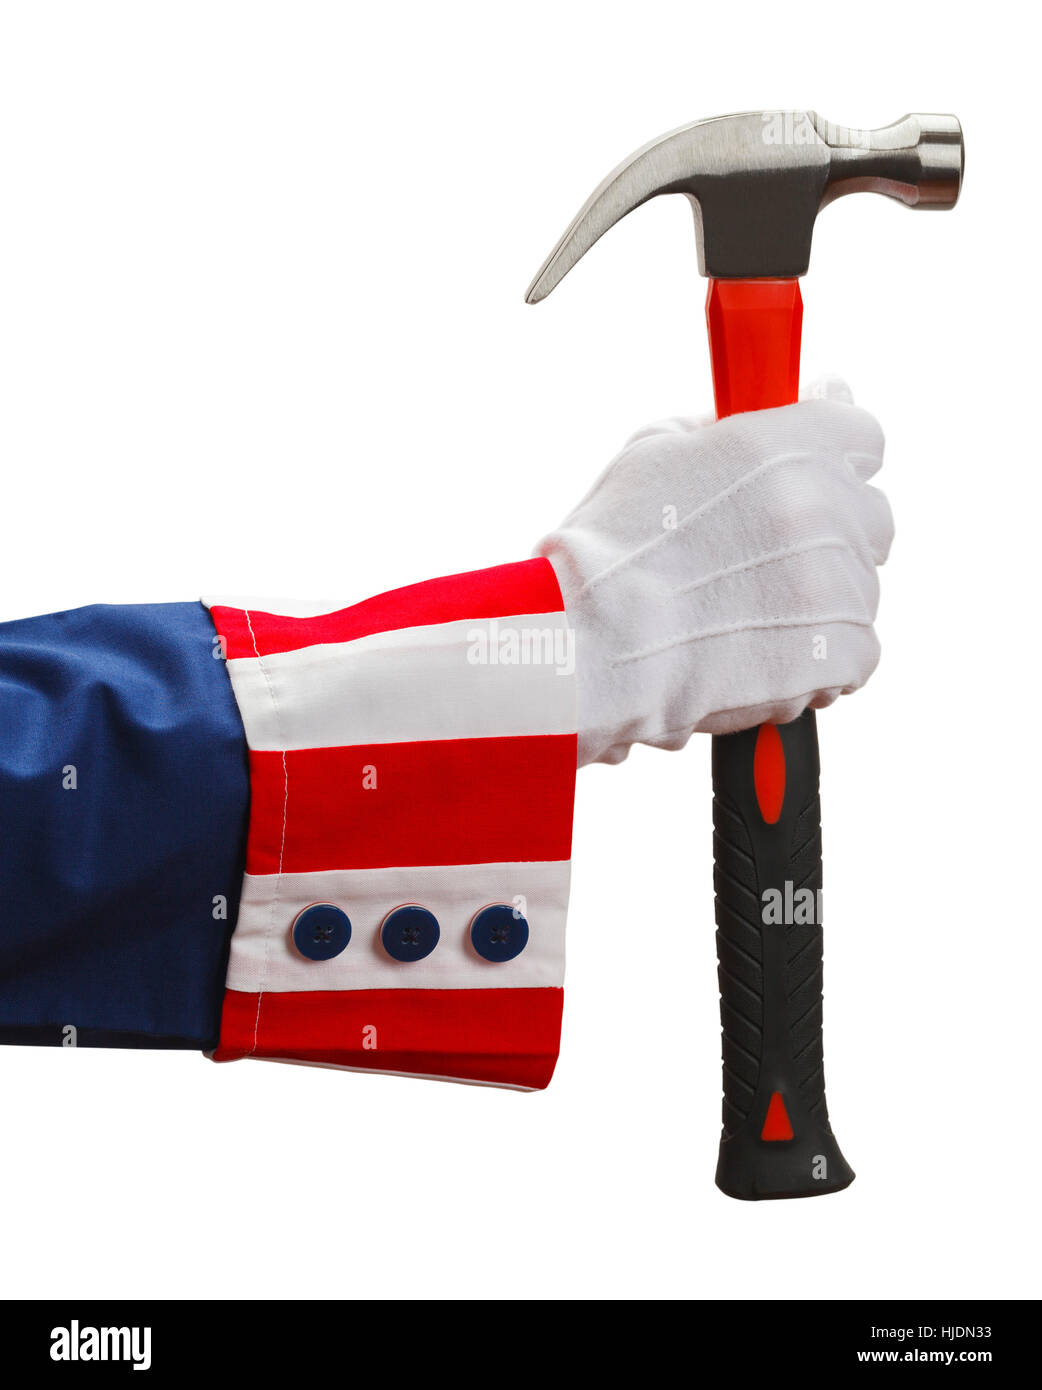 Presidente sosteniendo un martillo aislado sobre fondo blanco. Imagen De Stock